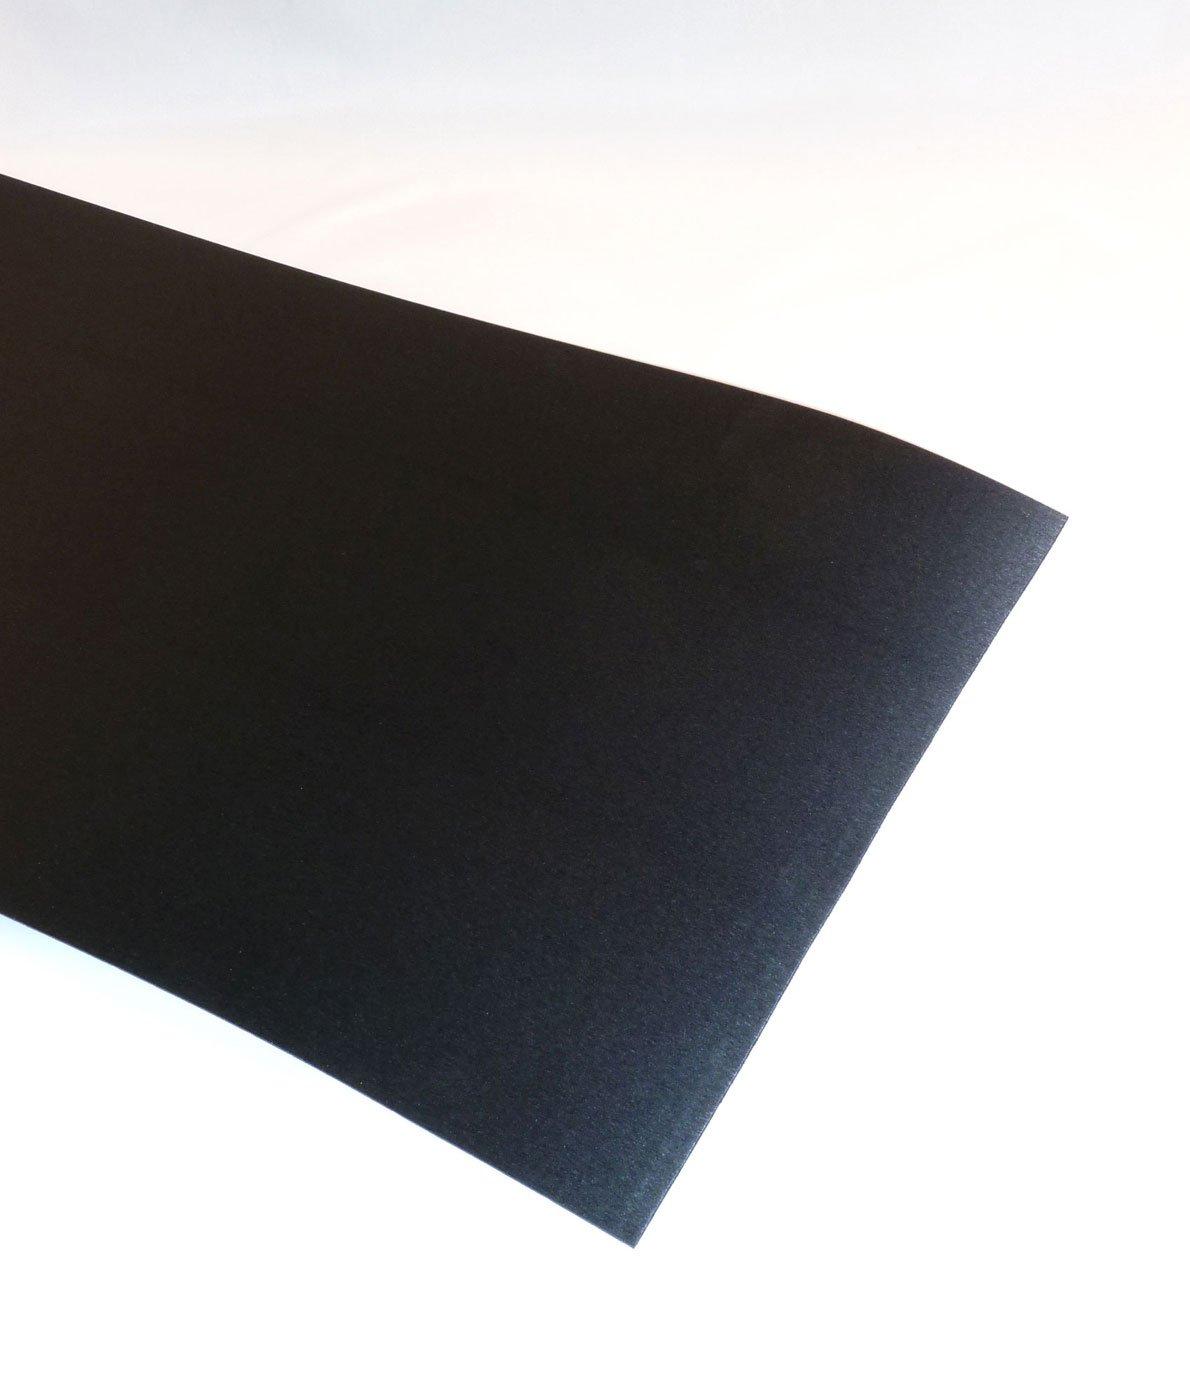 belag schwarz 33 cm | bau dir deinen ski | skibaumarkt.de